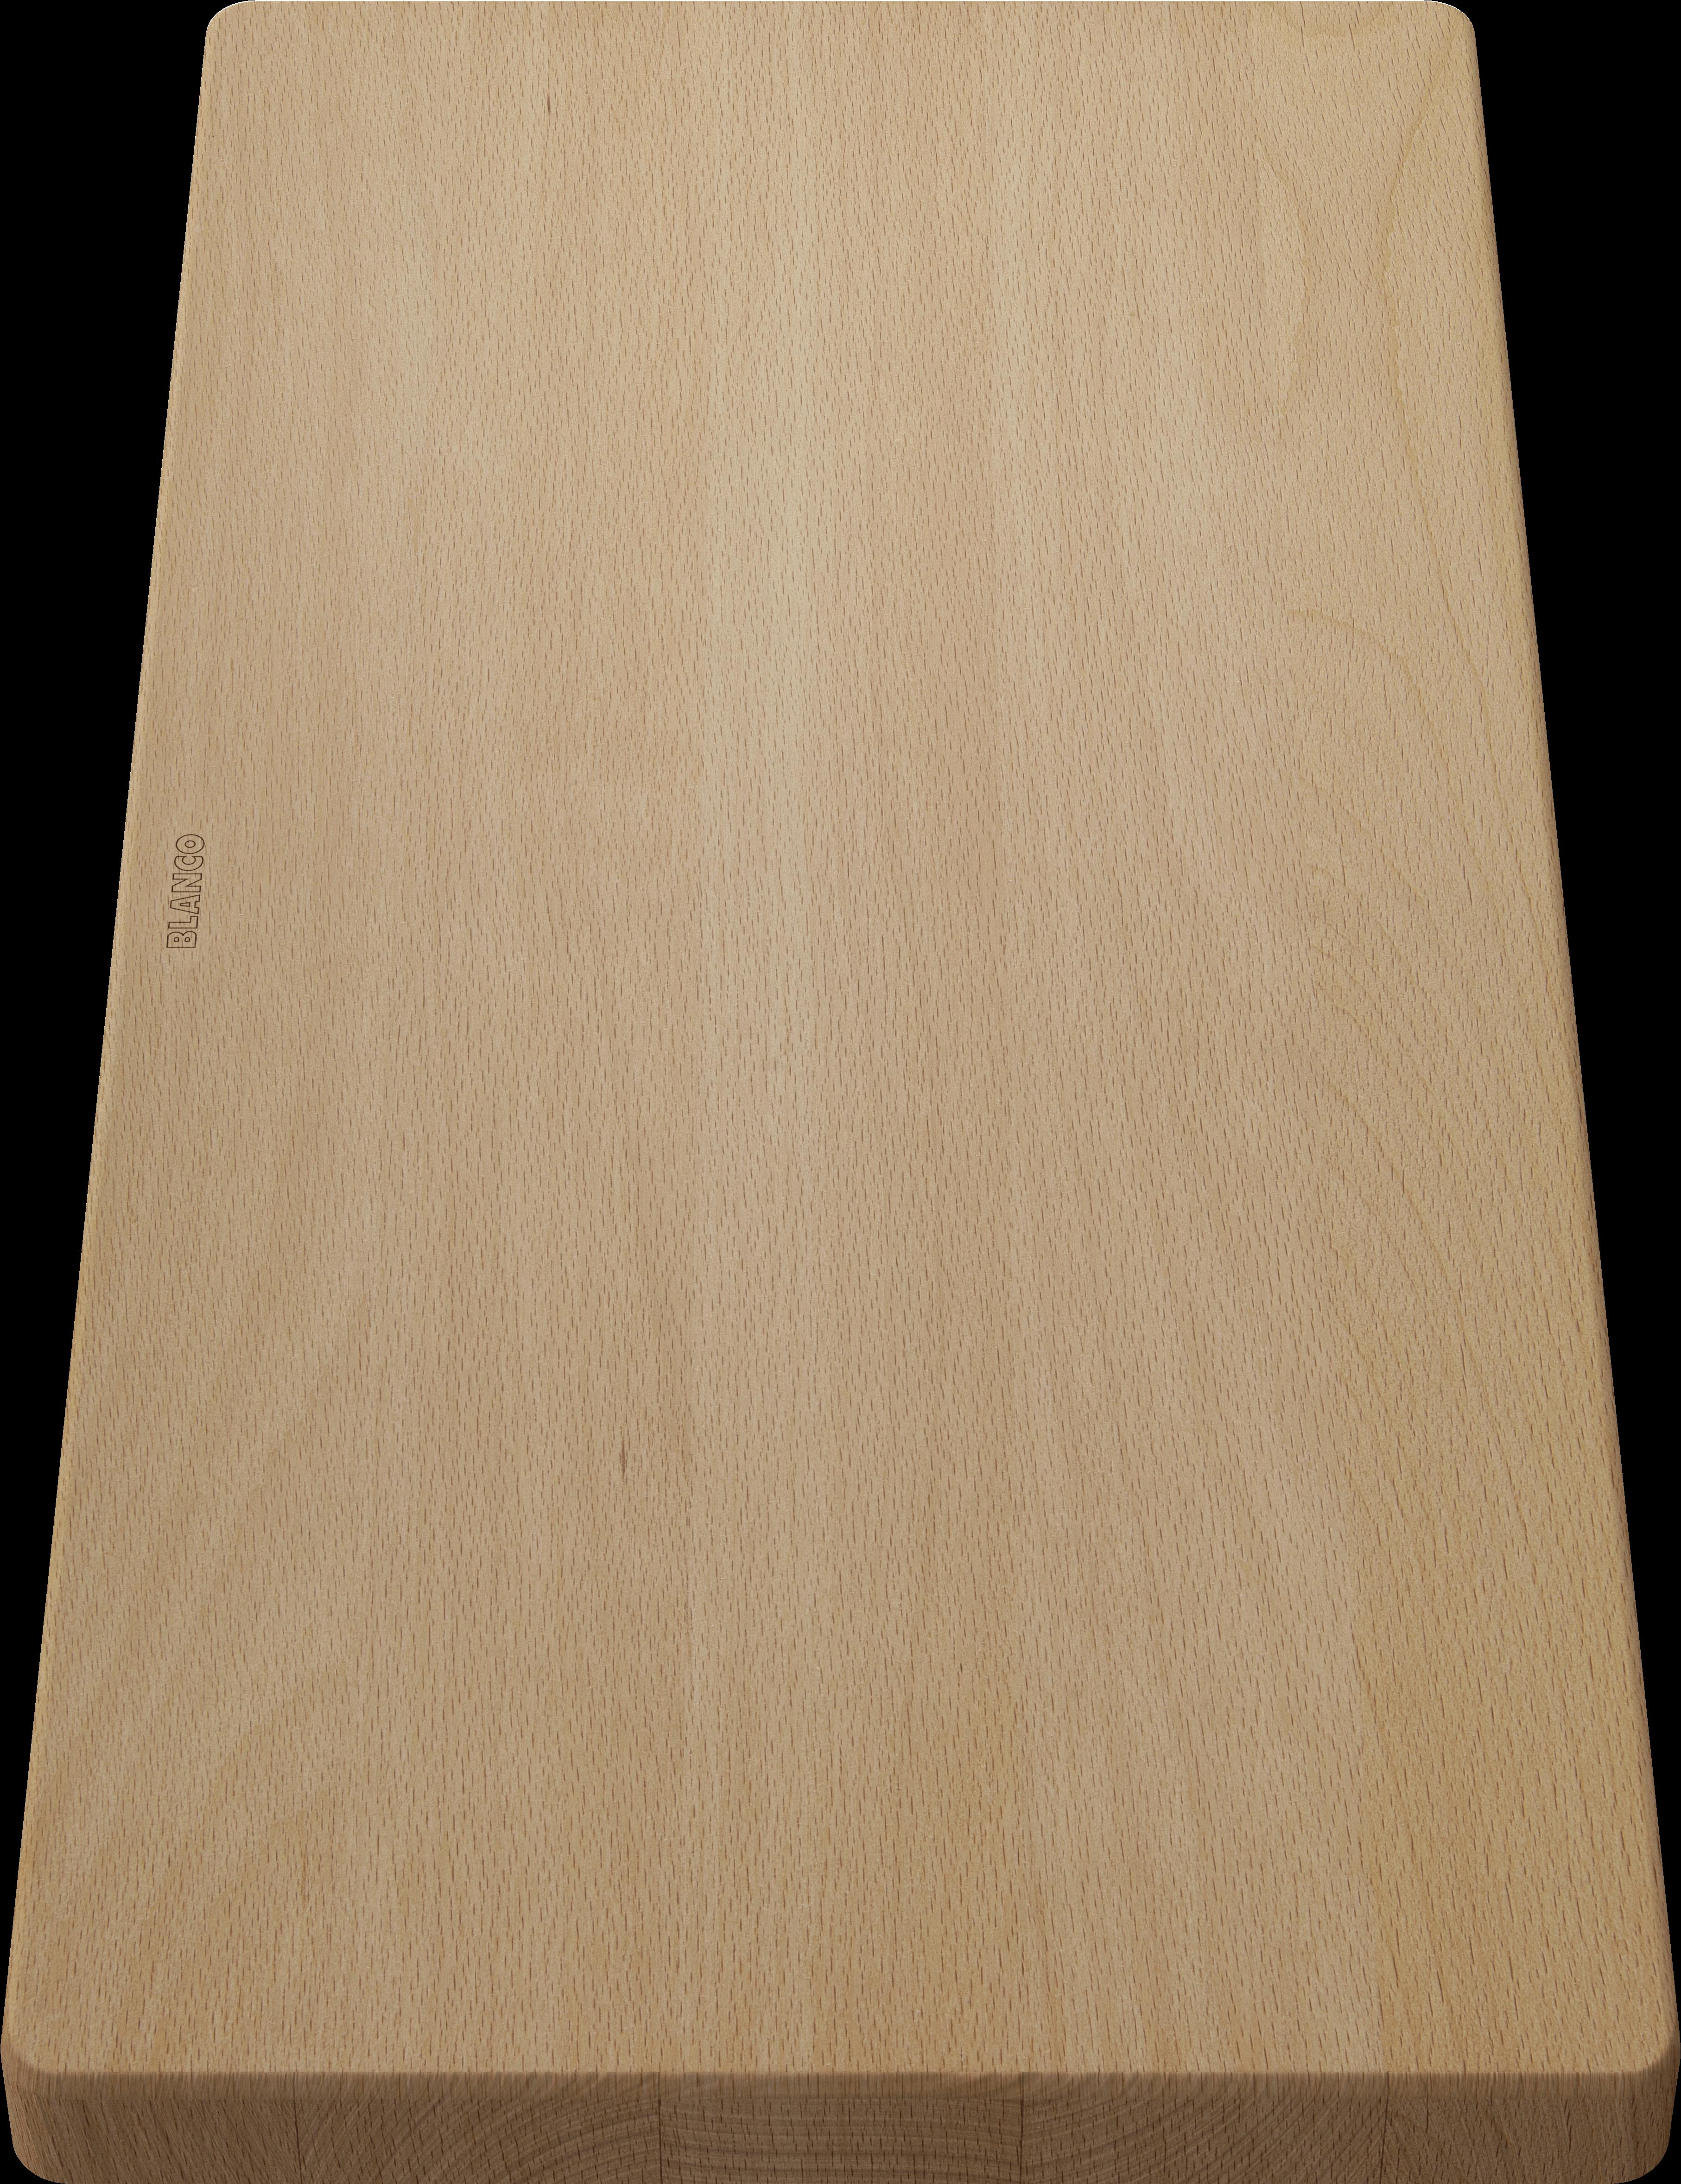 Schneidbrett aus massiver Buche